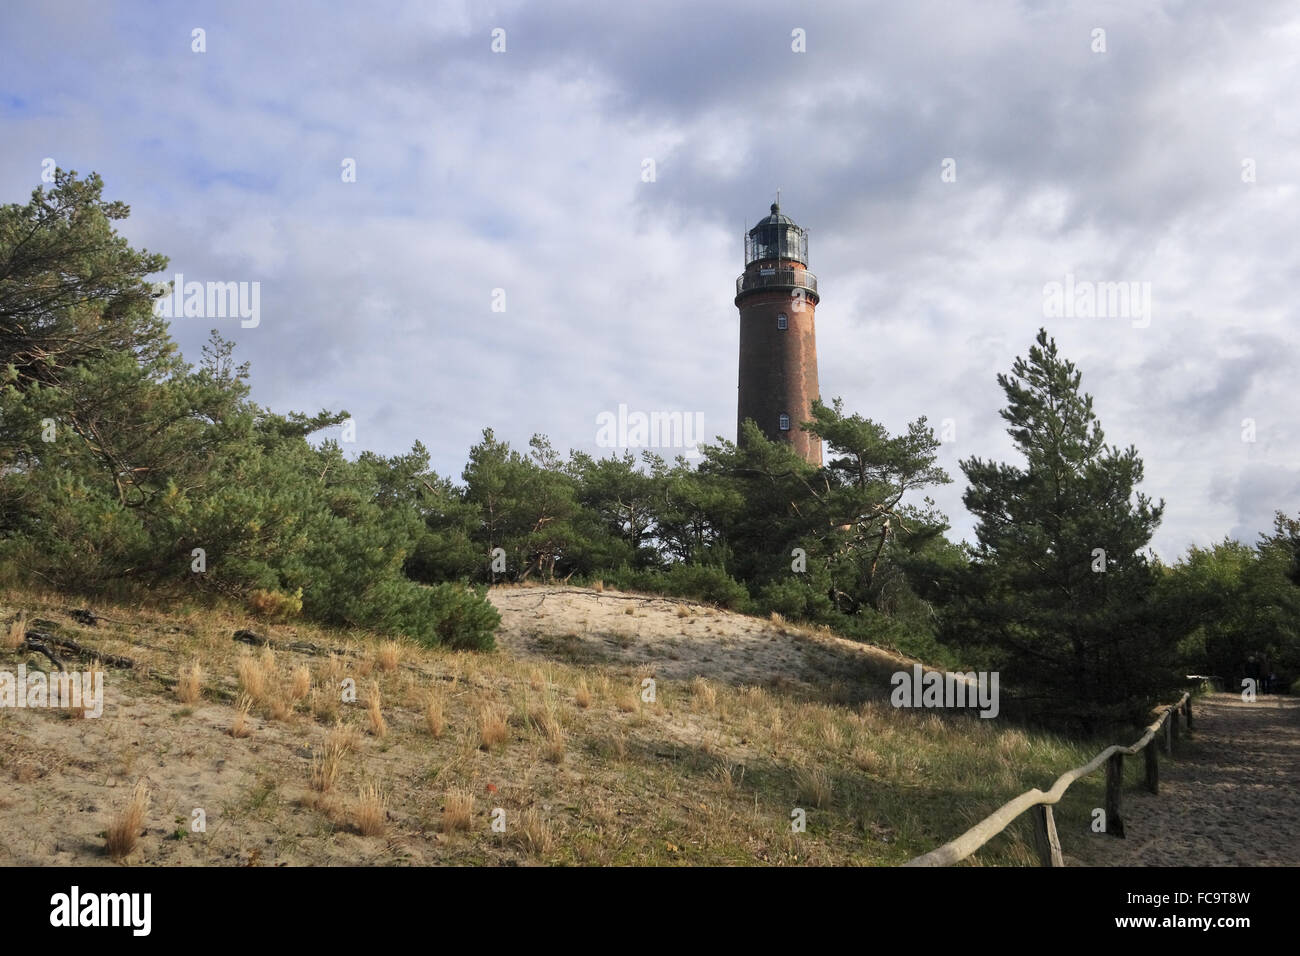 Lighthouse Darßer Ort - Stock Image